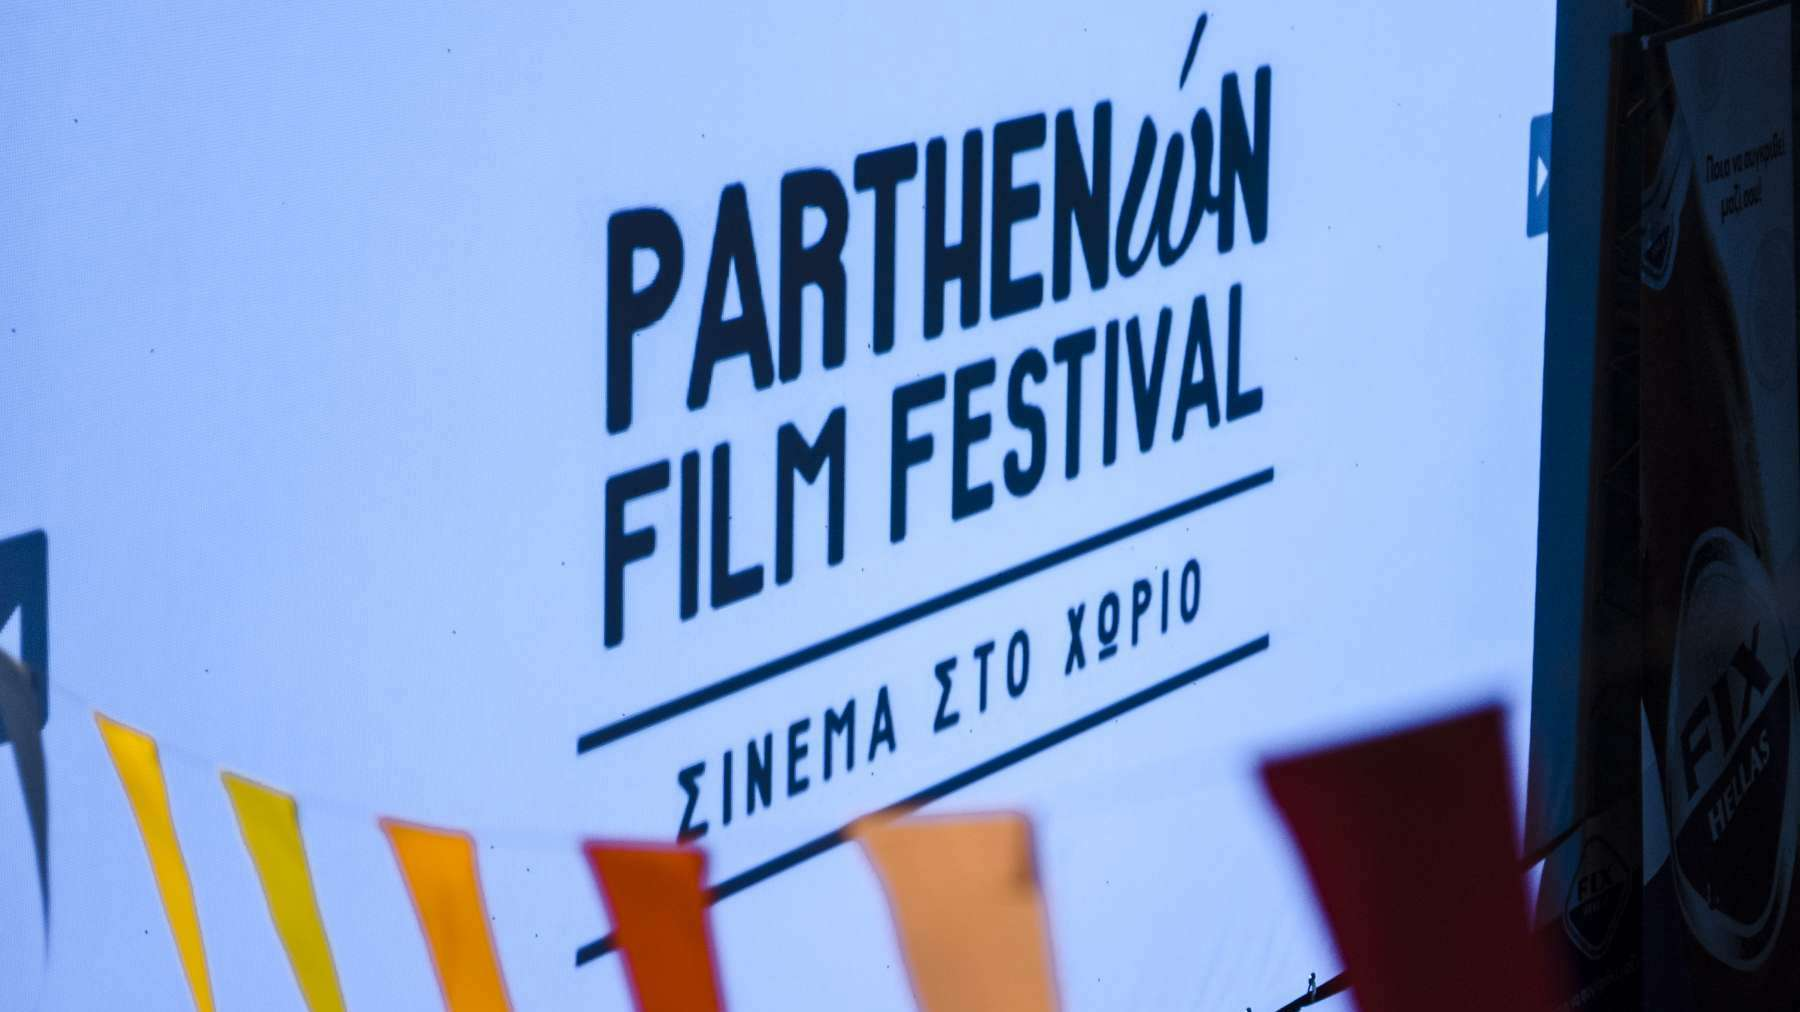 5o Parthenώn Film Festival – Σινεμά στο χωριό